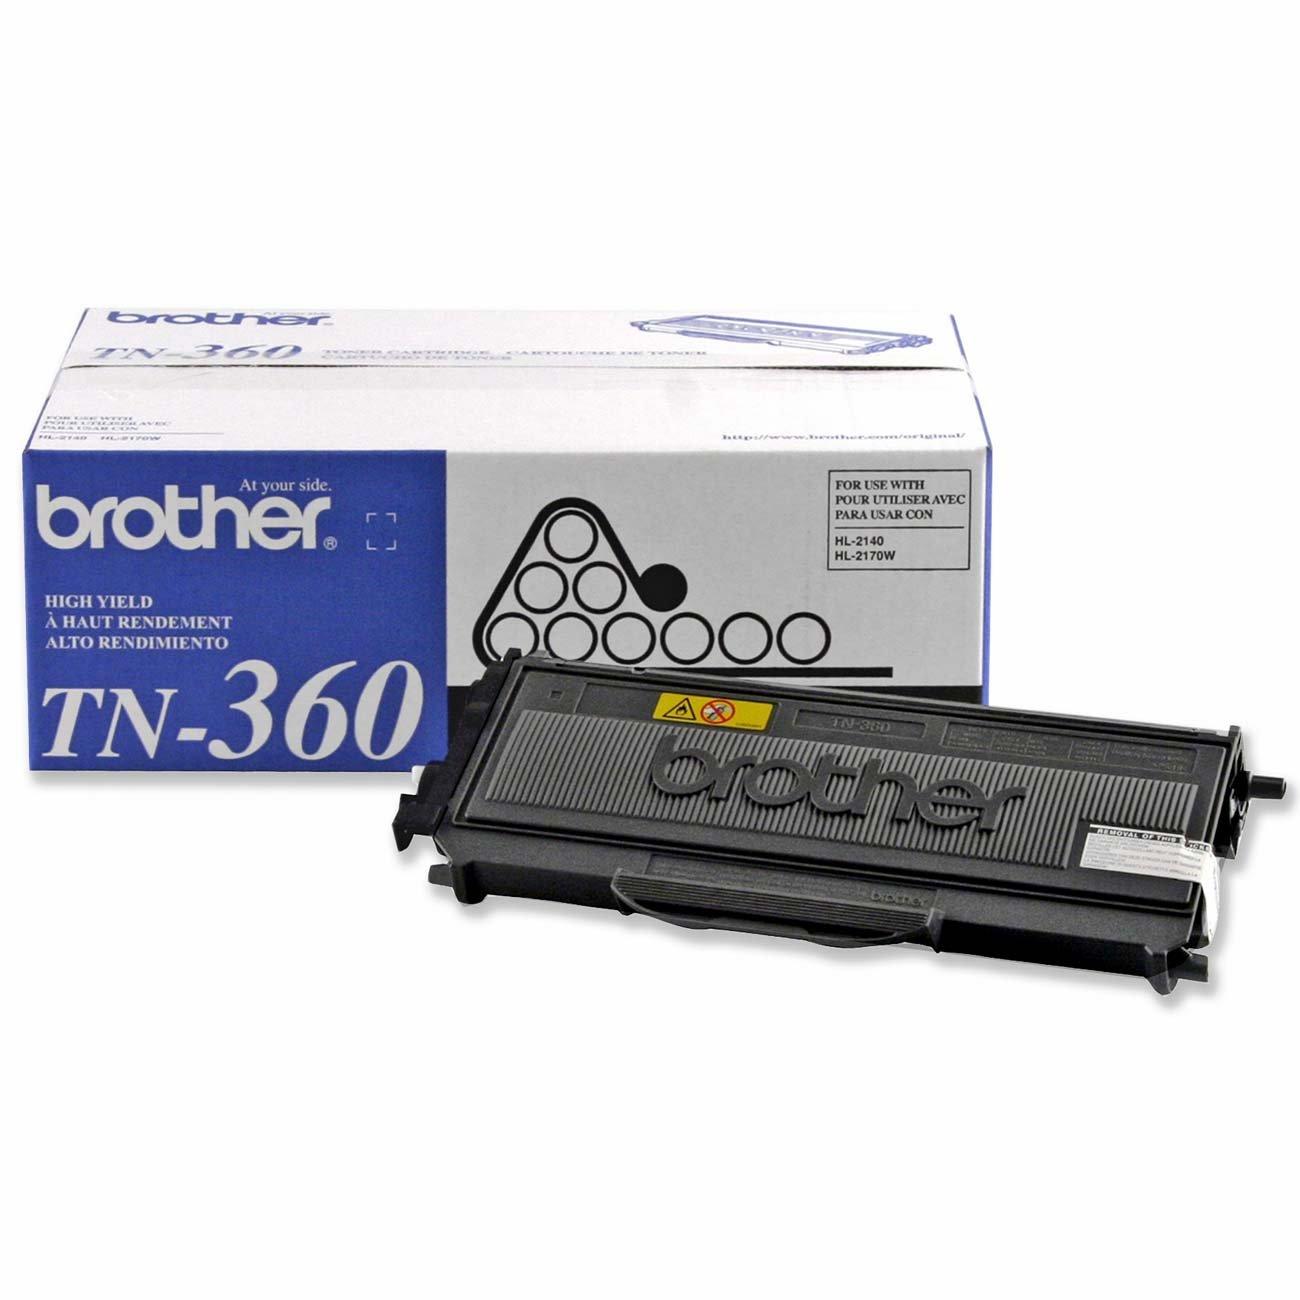 Brother 激光打印机 全新硒鼓 墨盒